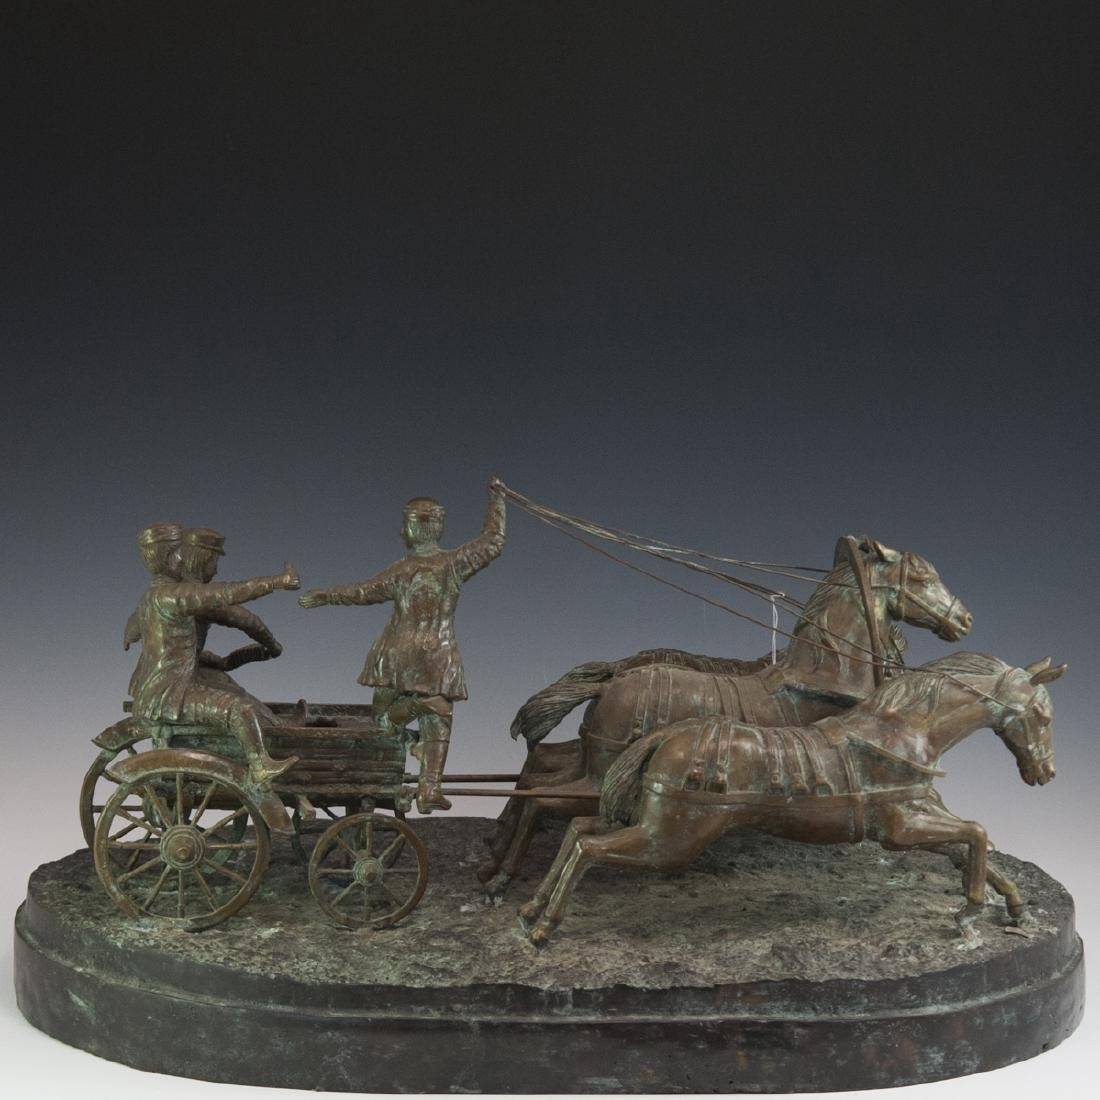 Antique Russian Figural Bronze Sculpture